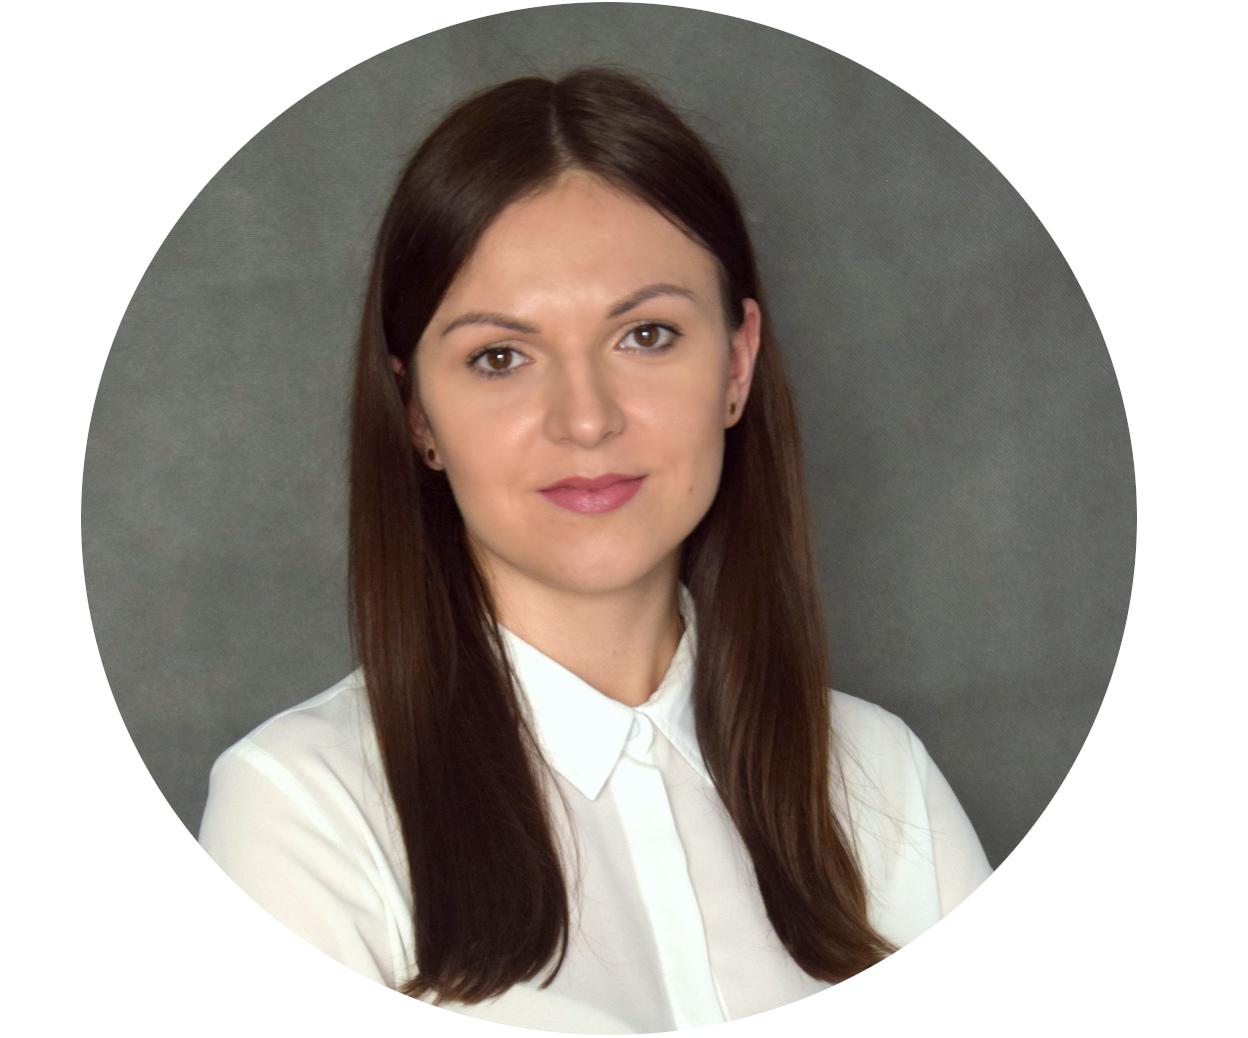 Monika Kaźmierczak